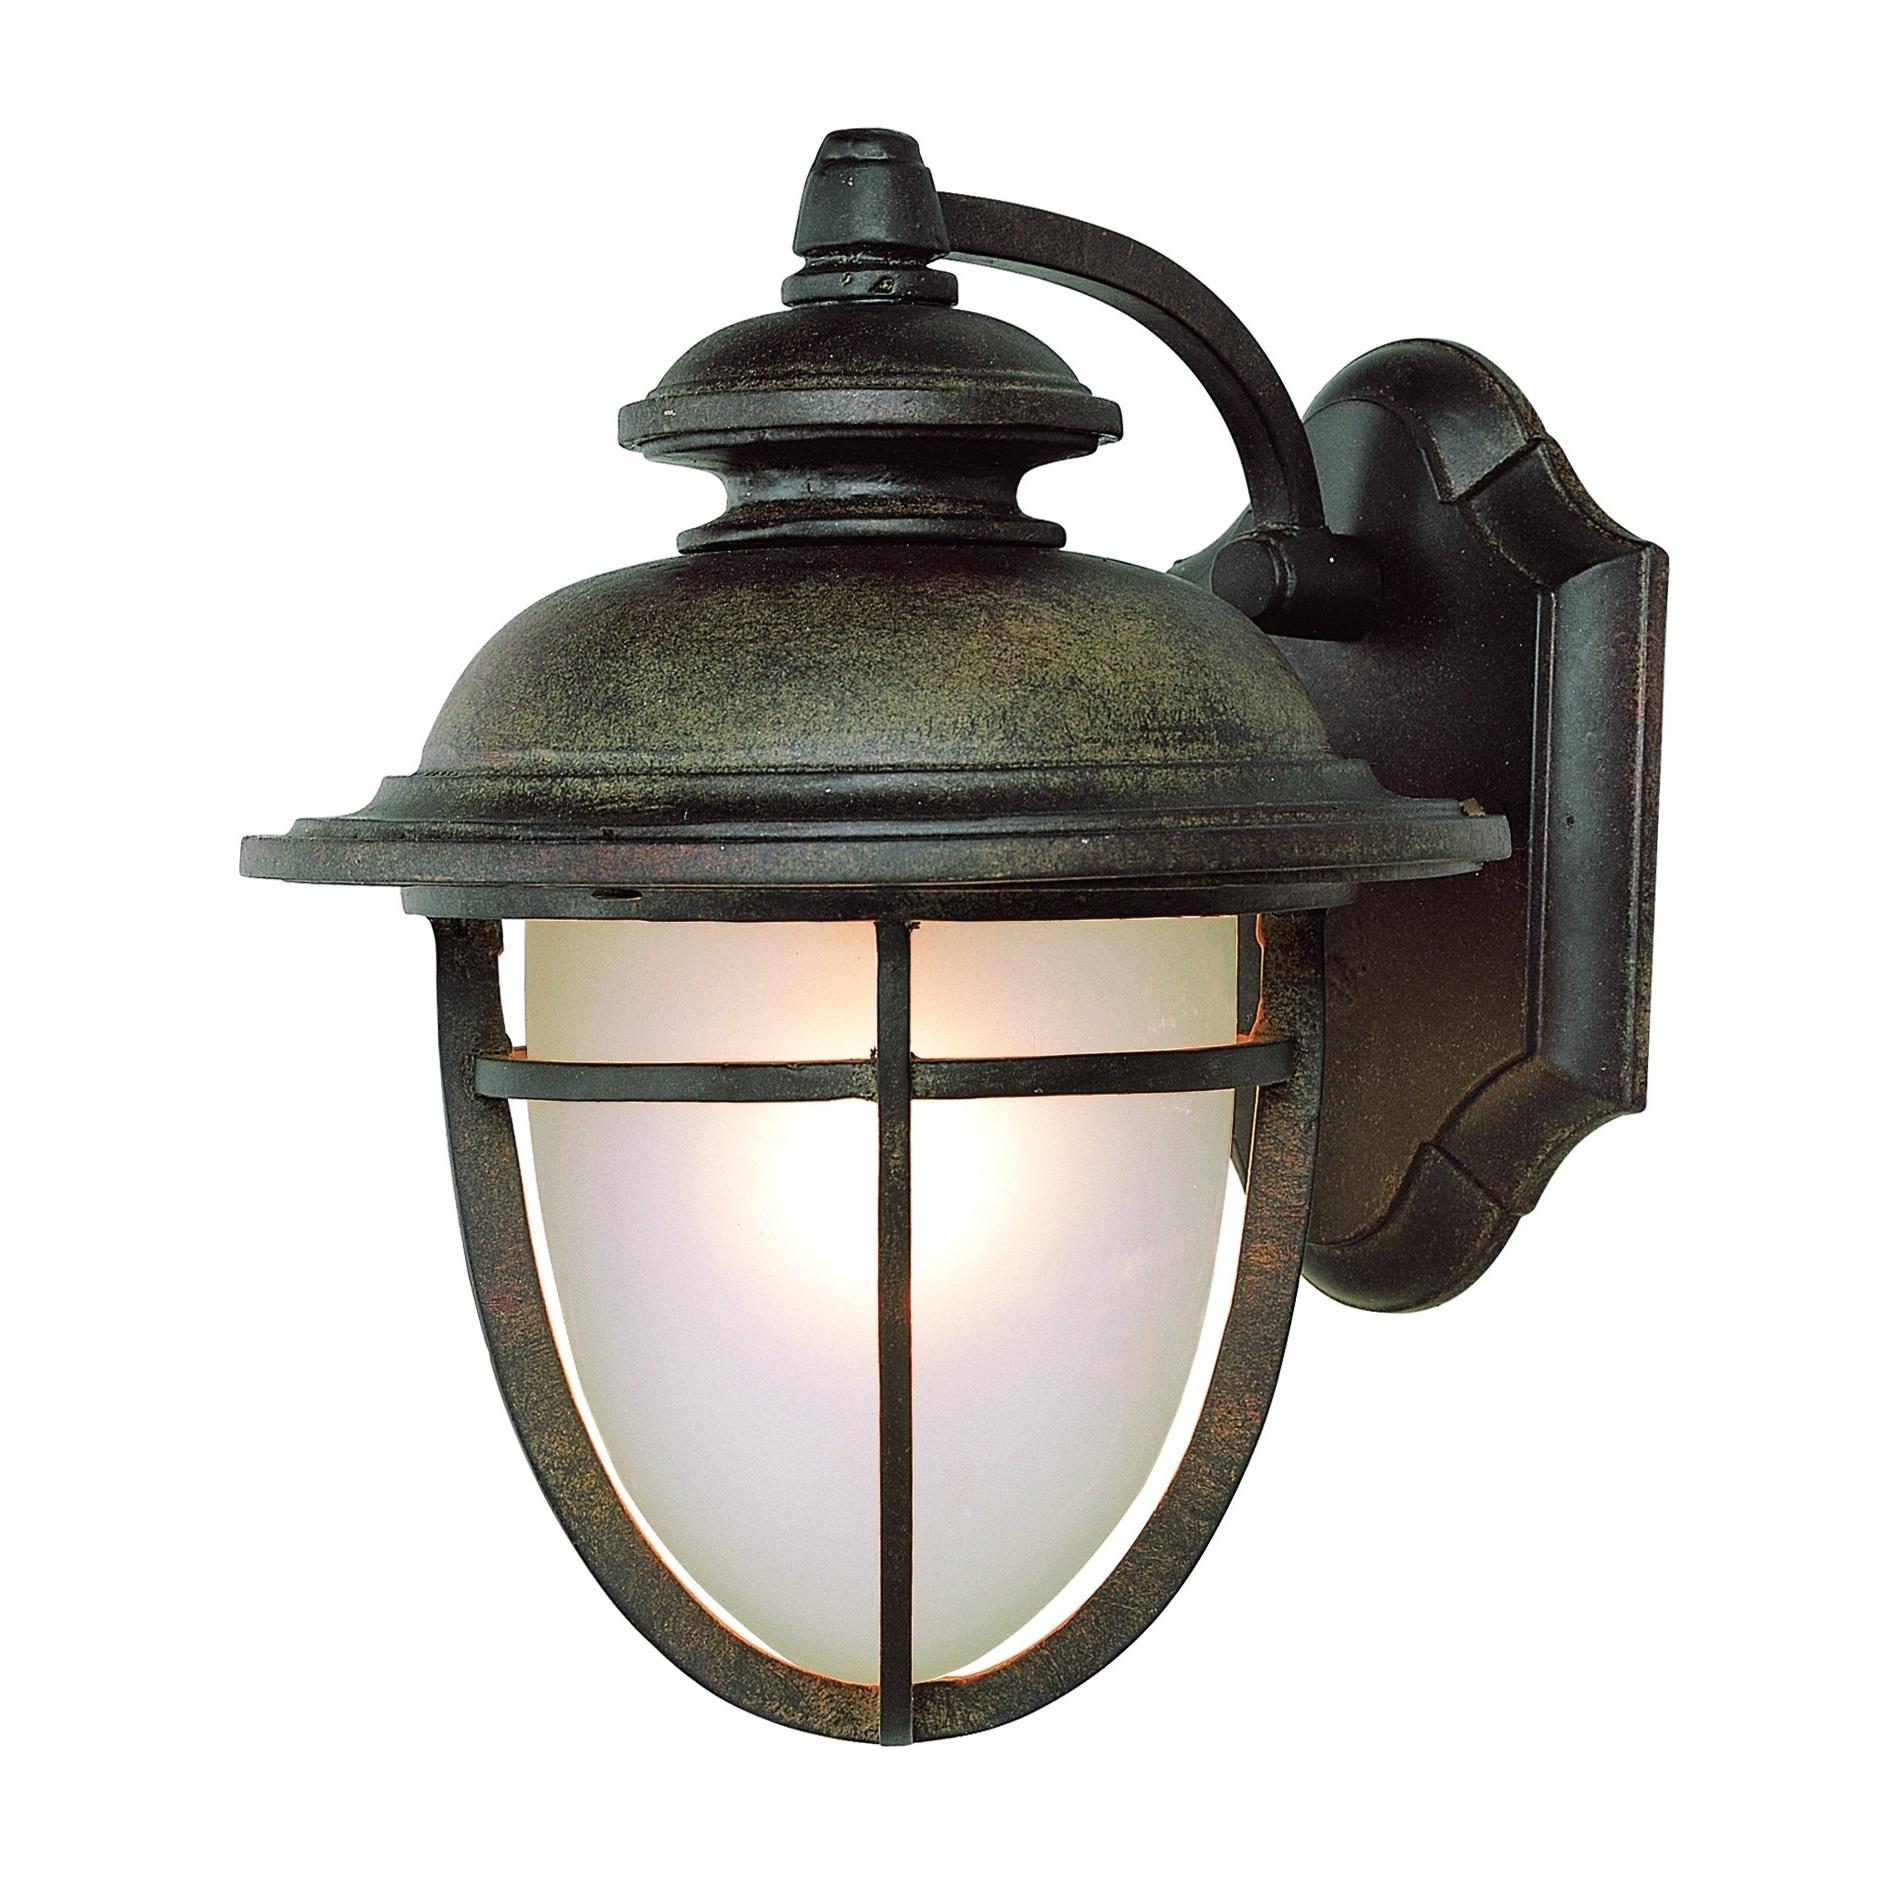 Latest Nayen Black 23'' H Wall Lanterns Within Transglobe Lighting Outdoor 1 Light Wall Lantern In Dark (View 11 of 15)